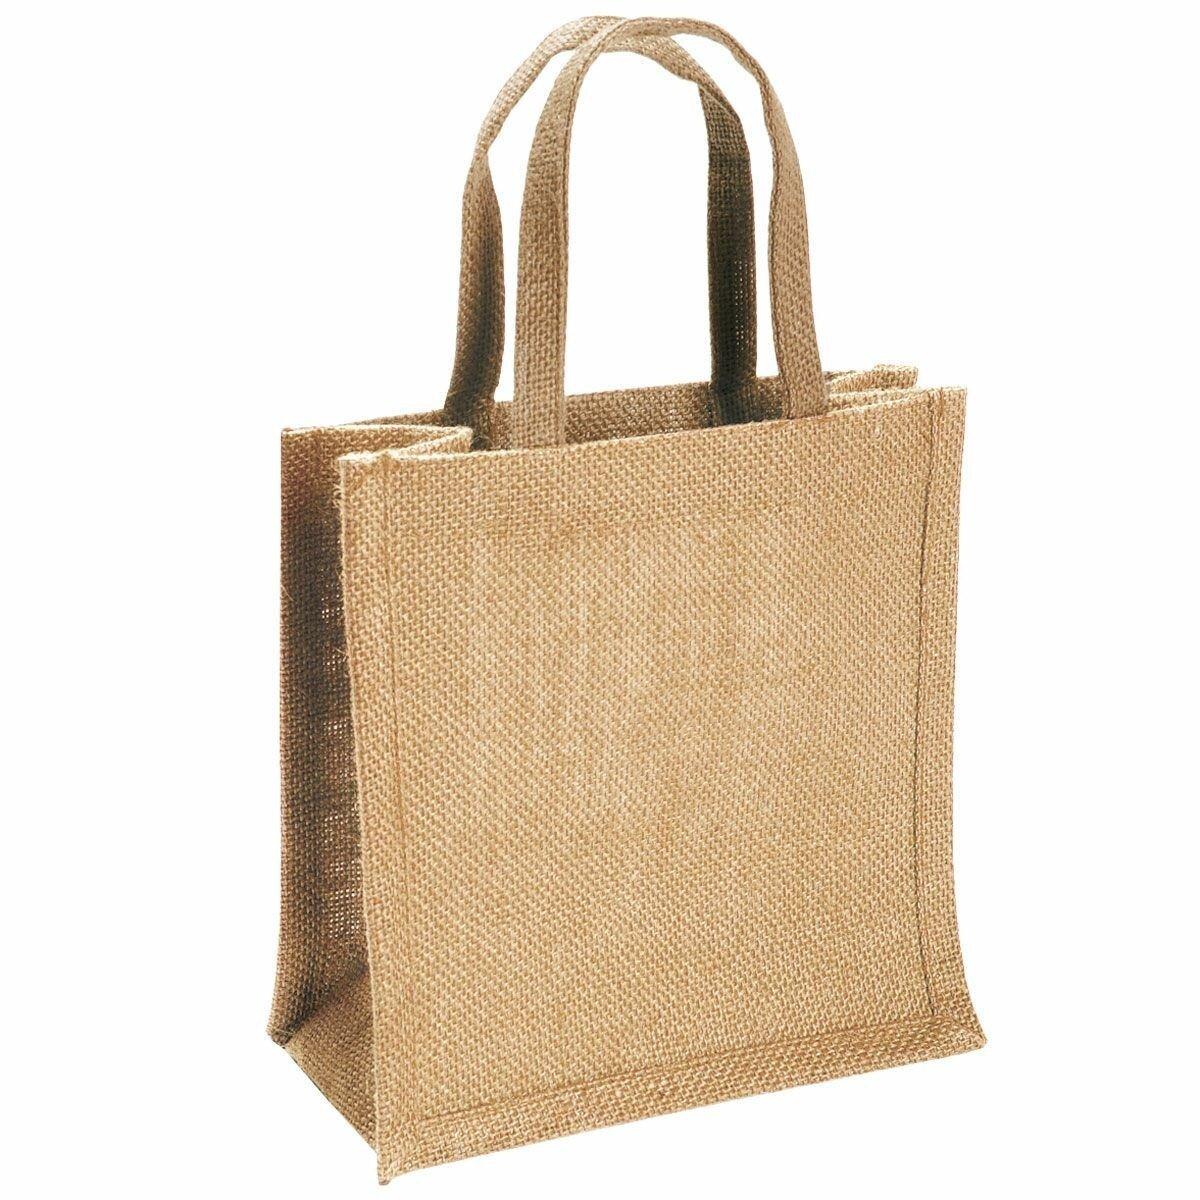 Сумка джутовая 35х40х15 см - фото джут сумка